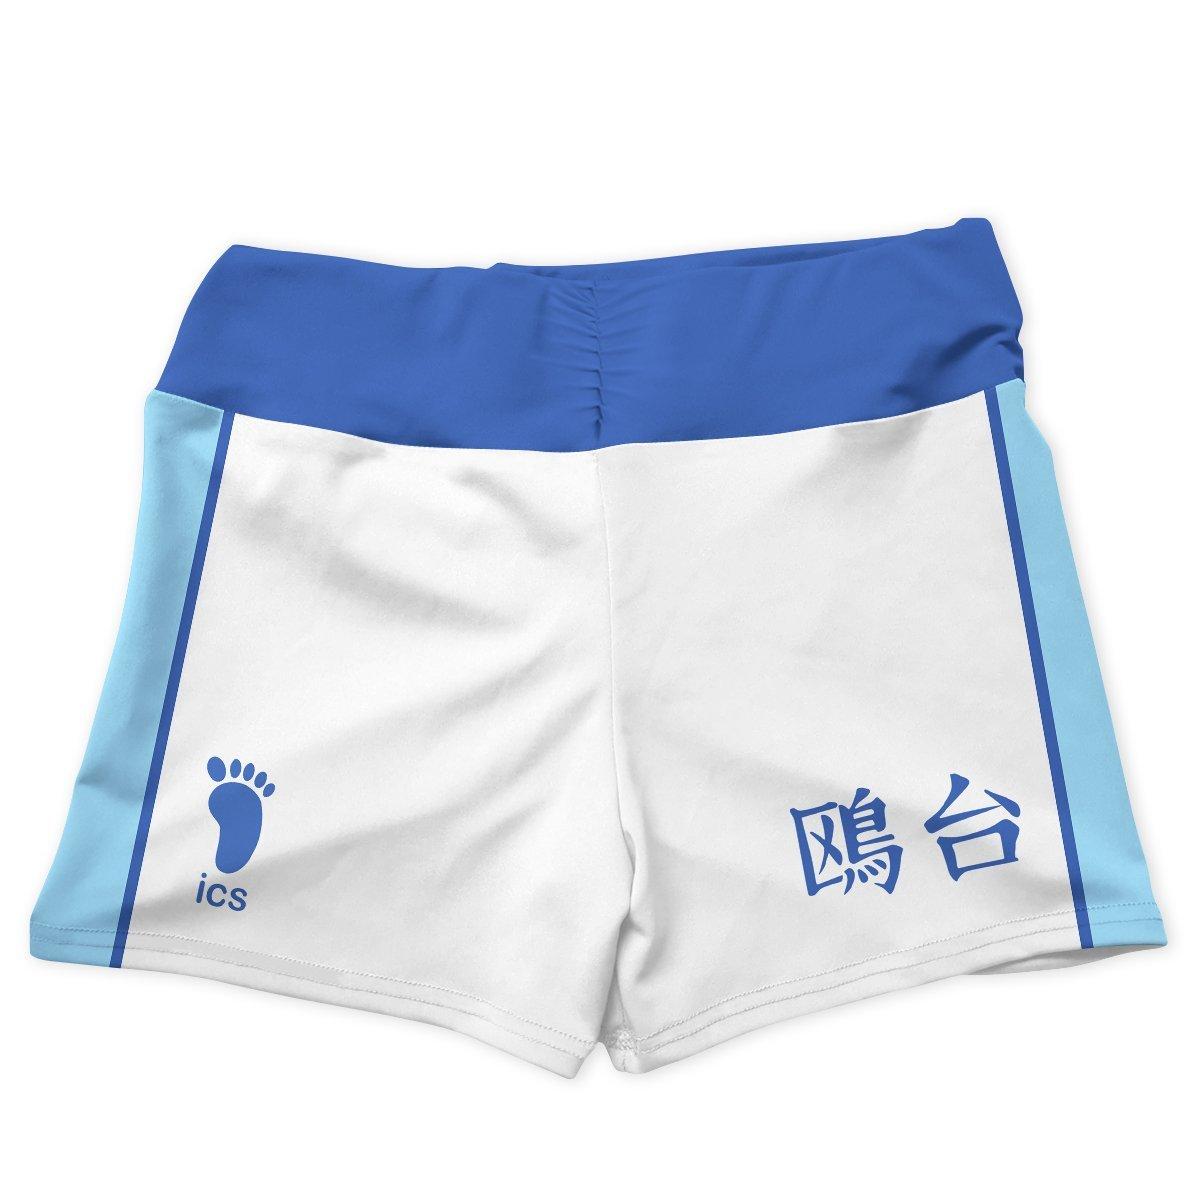 team kamomedai active wear set 196774 - Anime Swimsuits